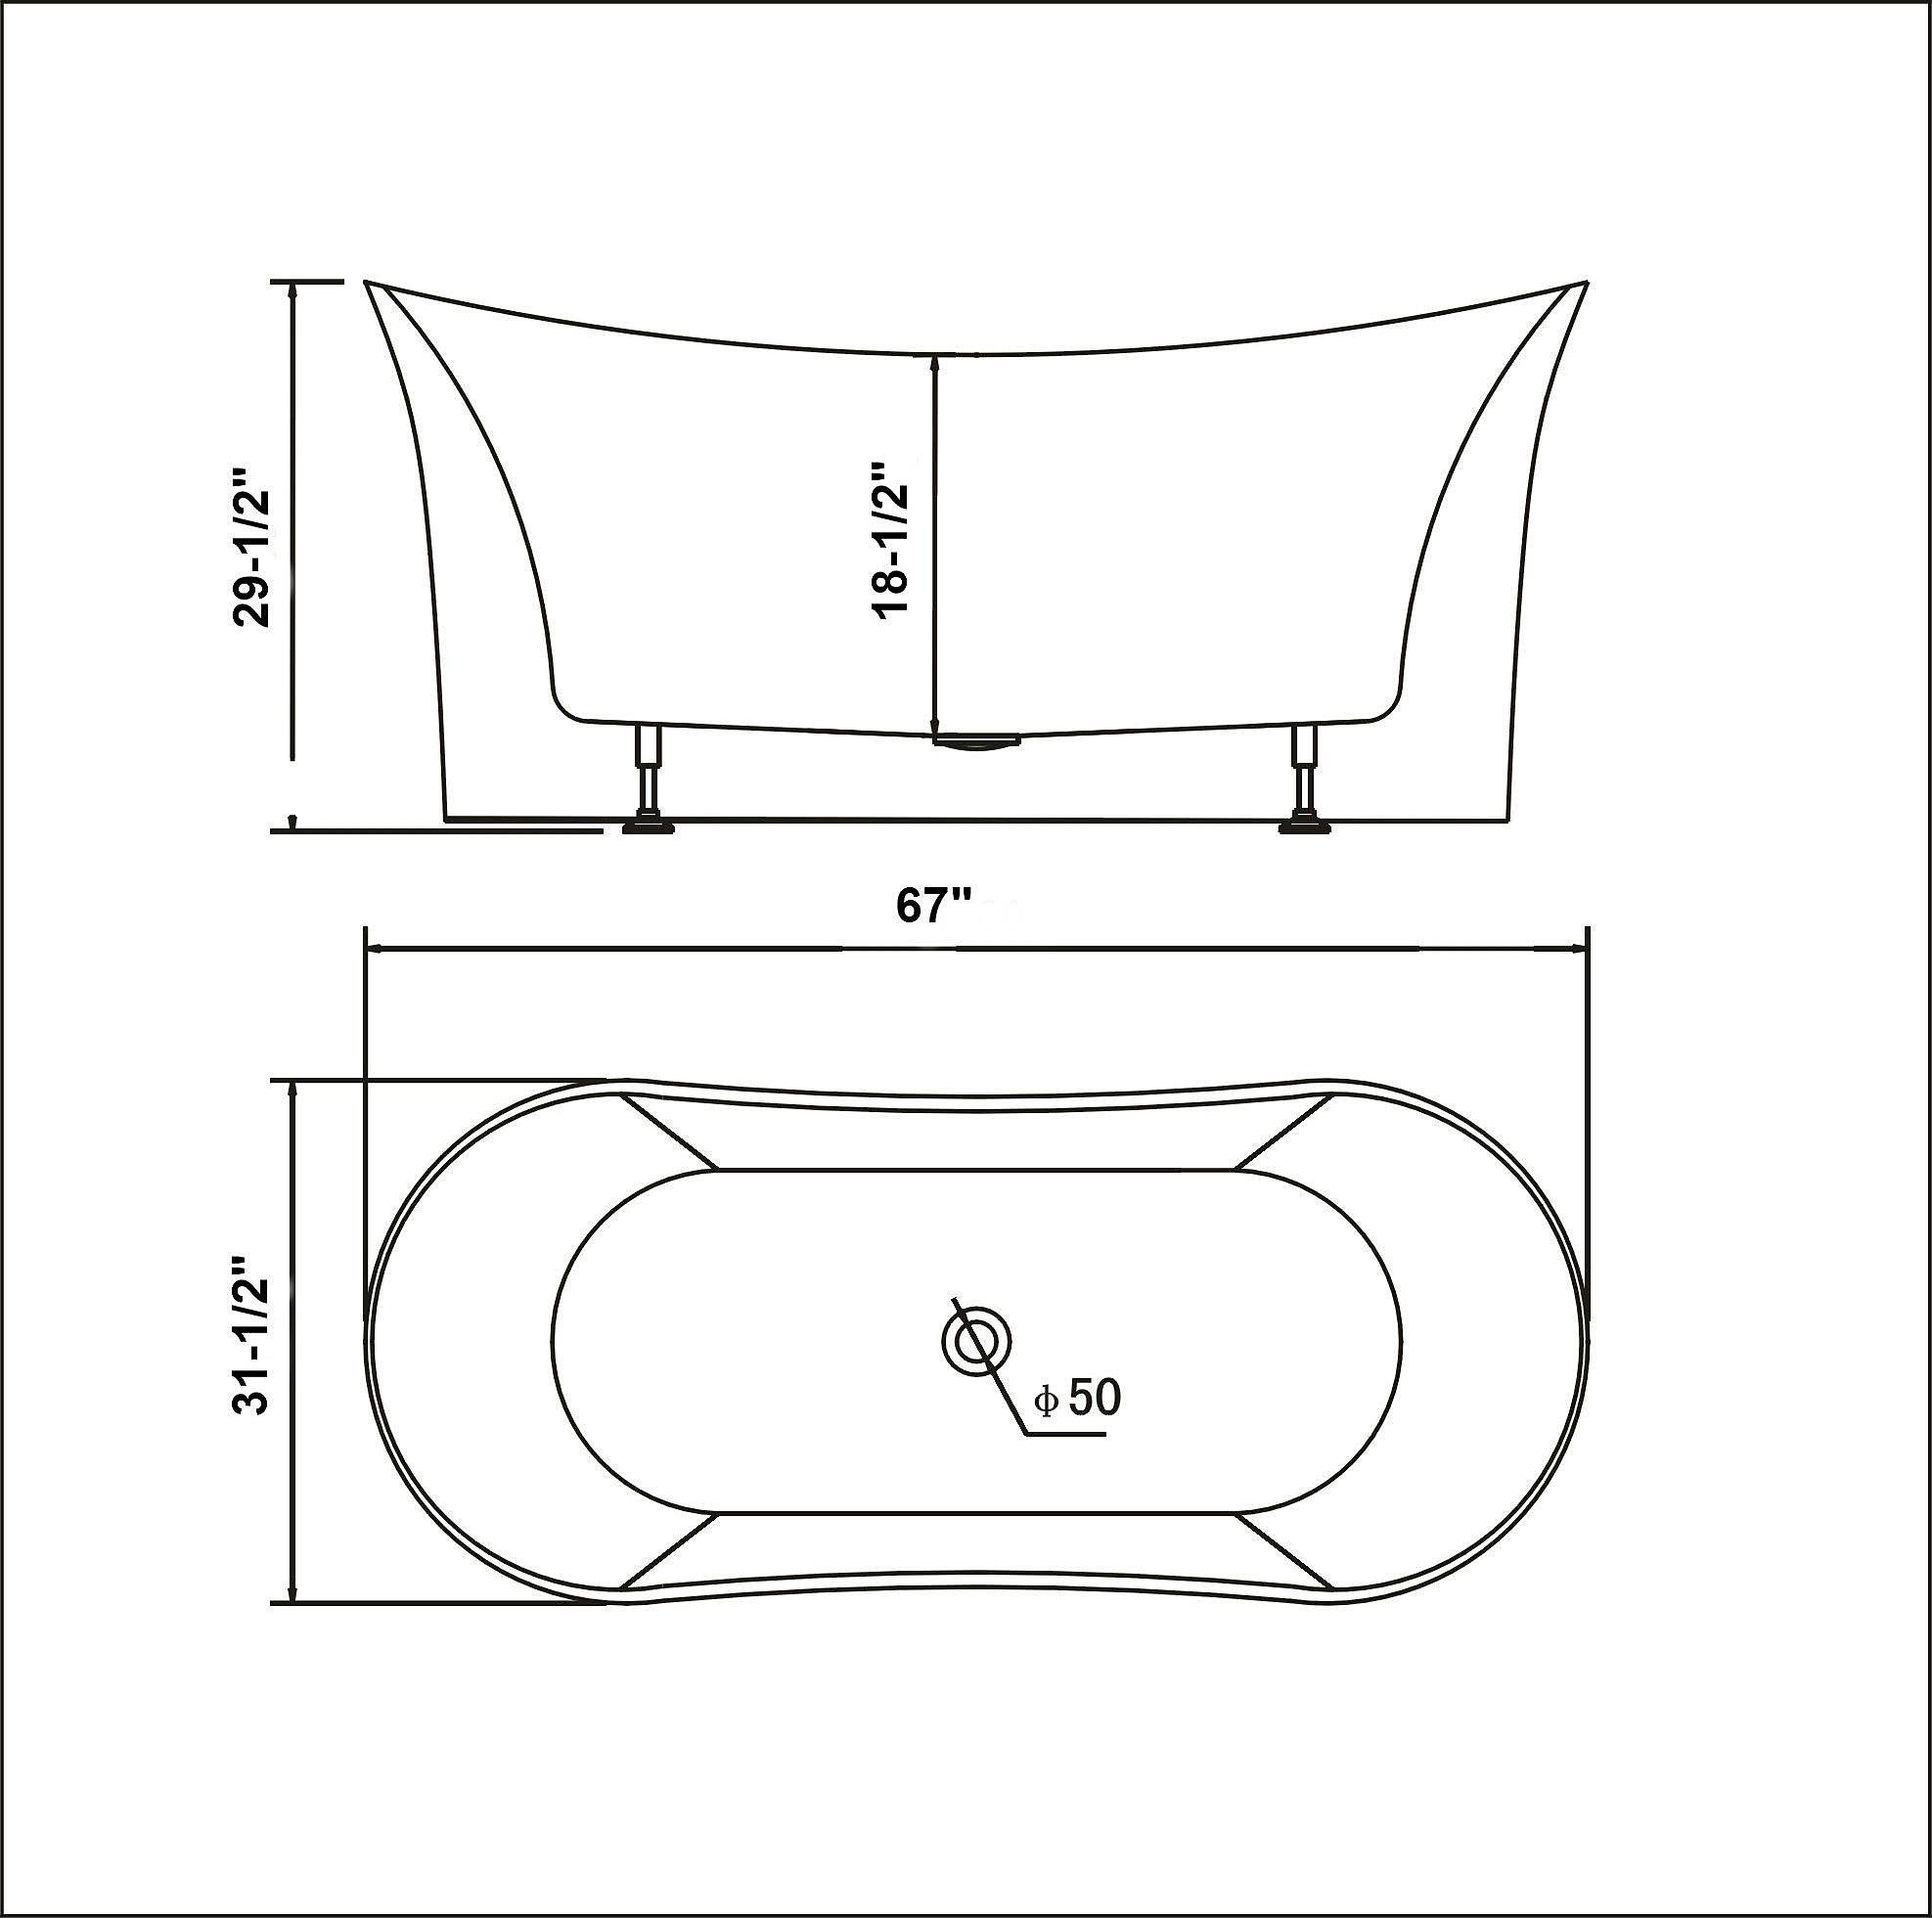 Dimensions Of A Tub Makrillarnacom - Corner garden tub dimensions